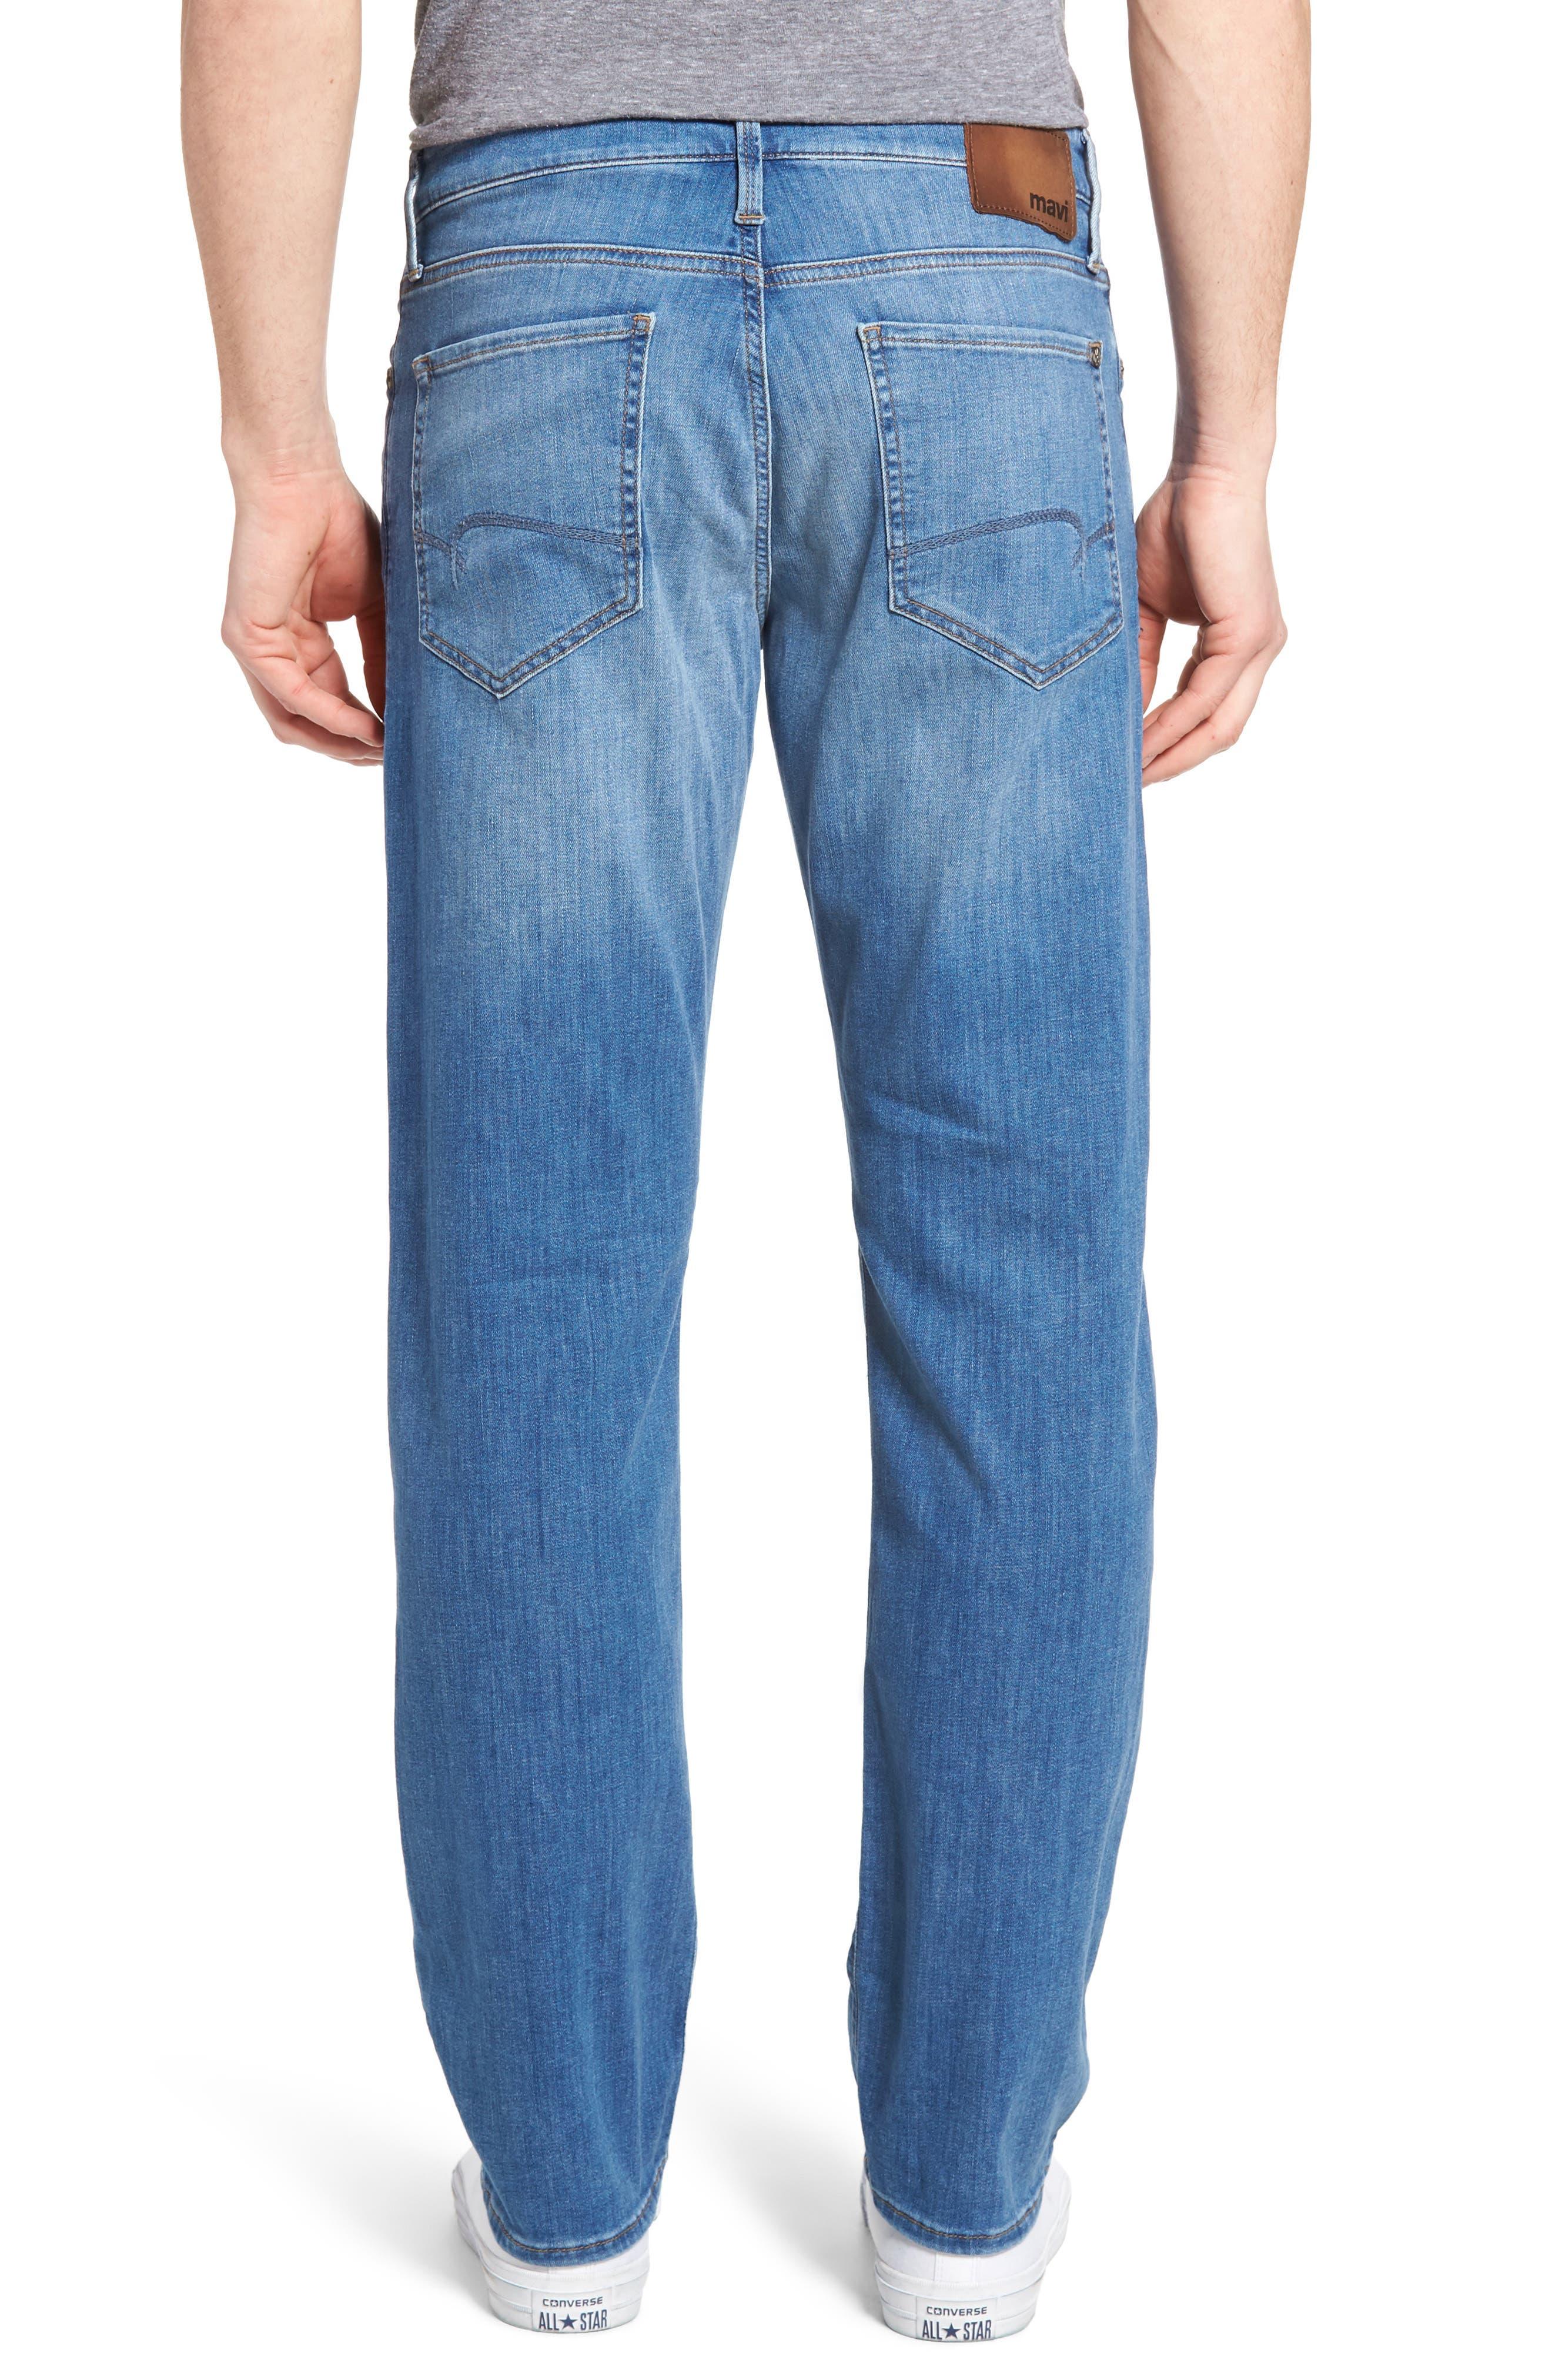 Myles Straight Leg Jeans,                             Alternate thumbnail 2, color,                             Mid Blue Portland